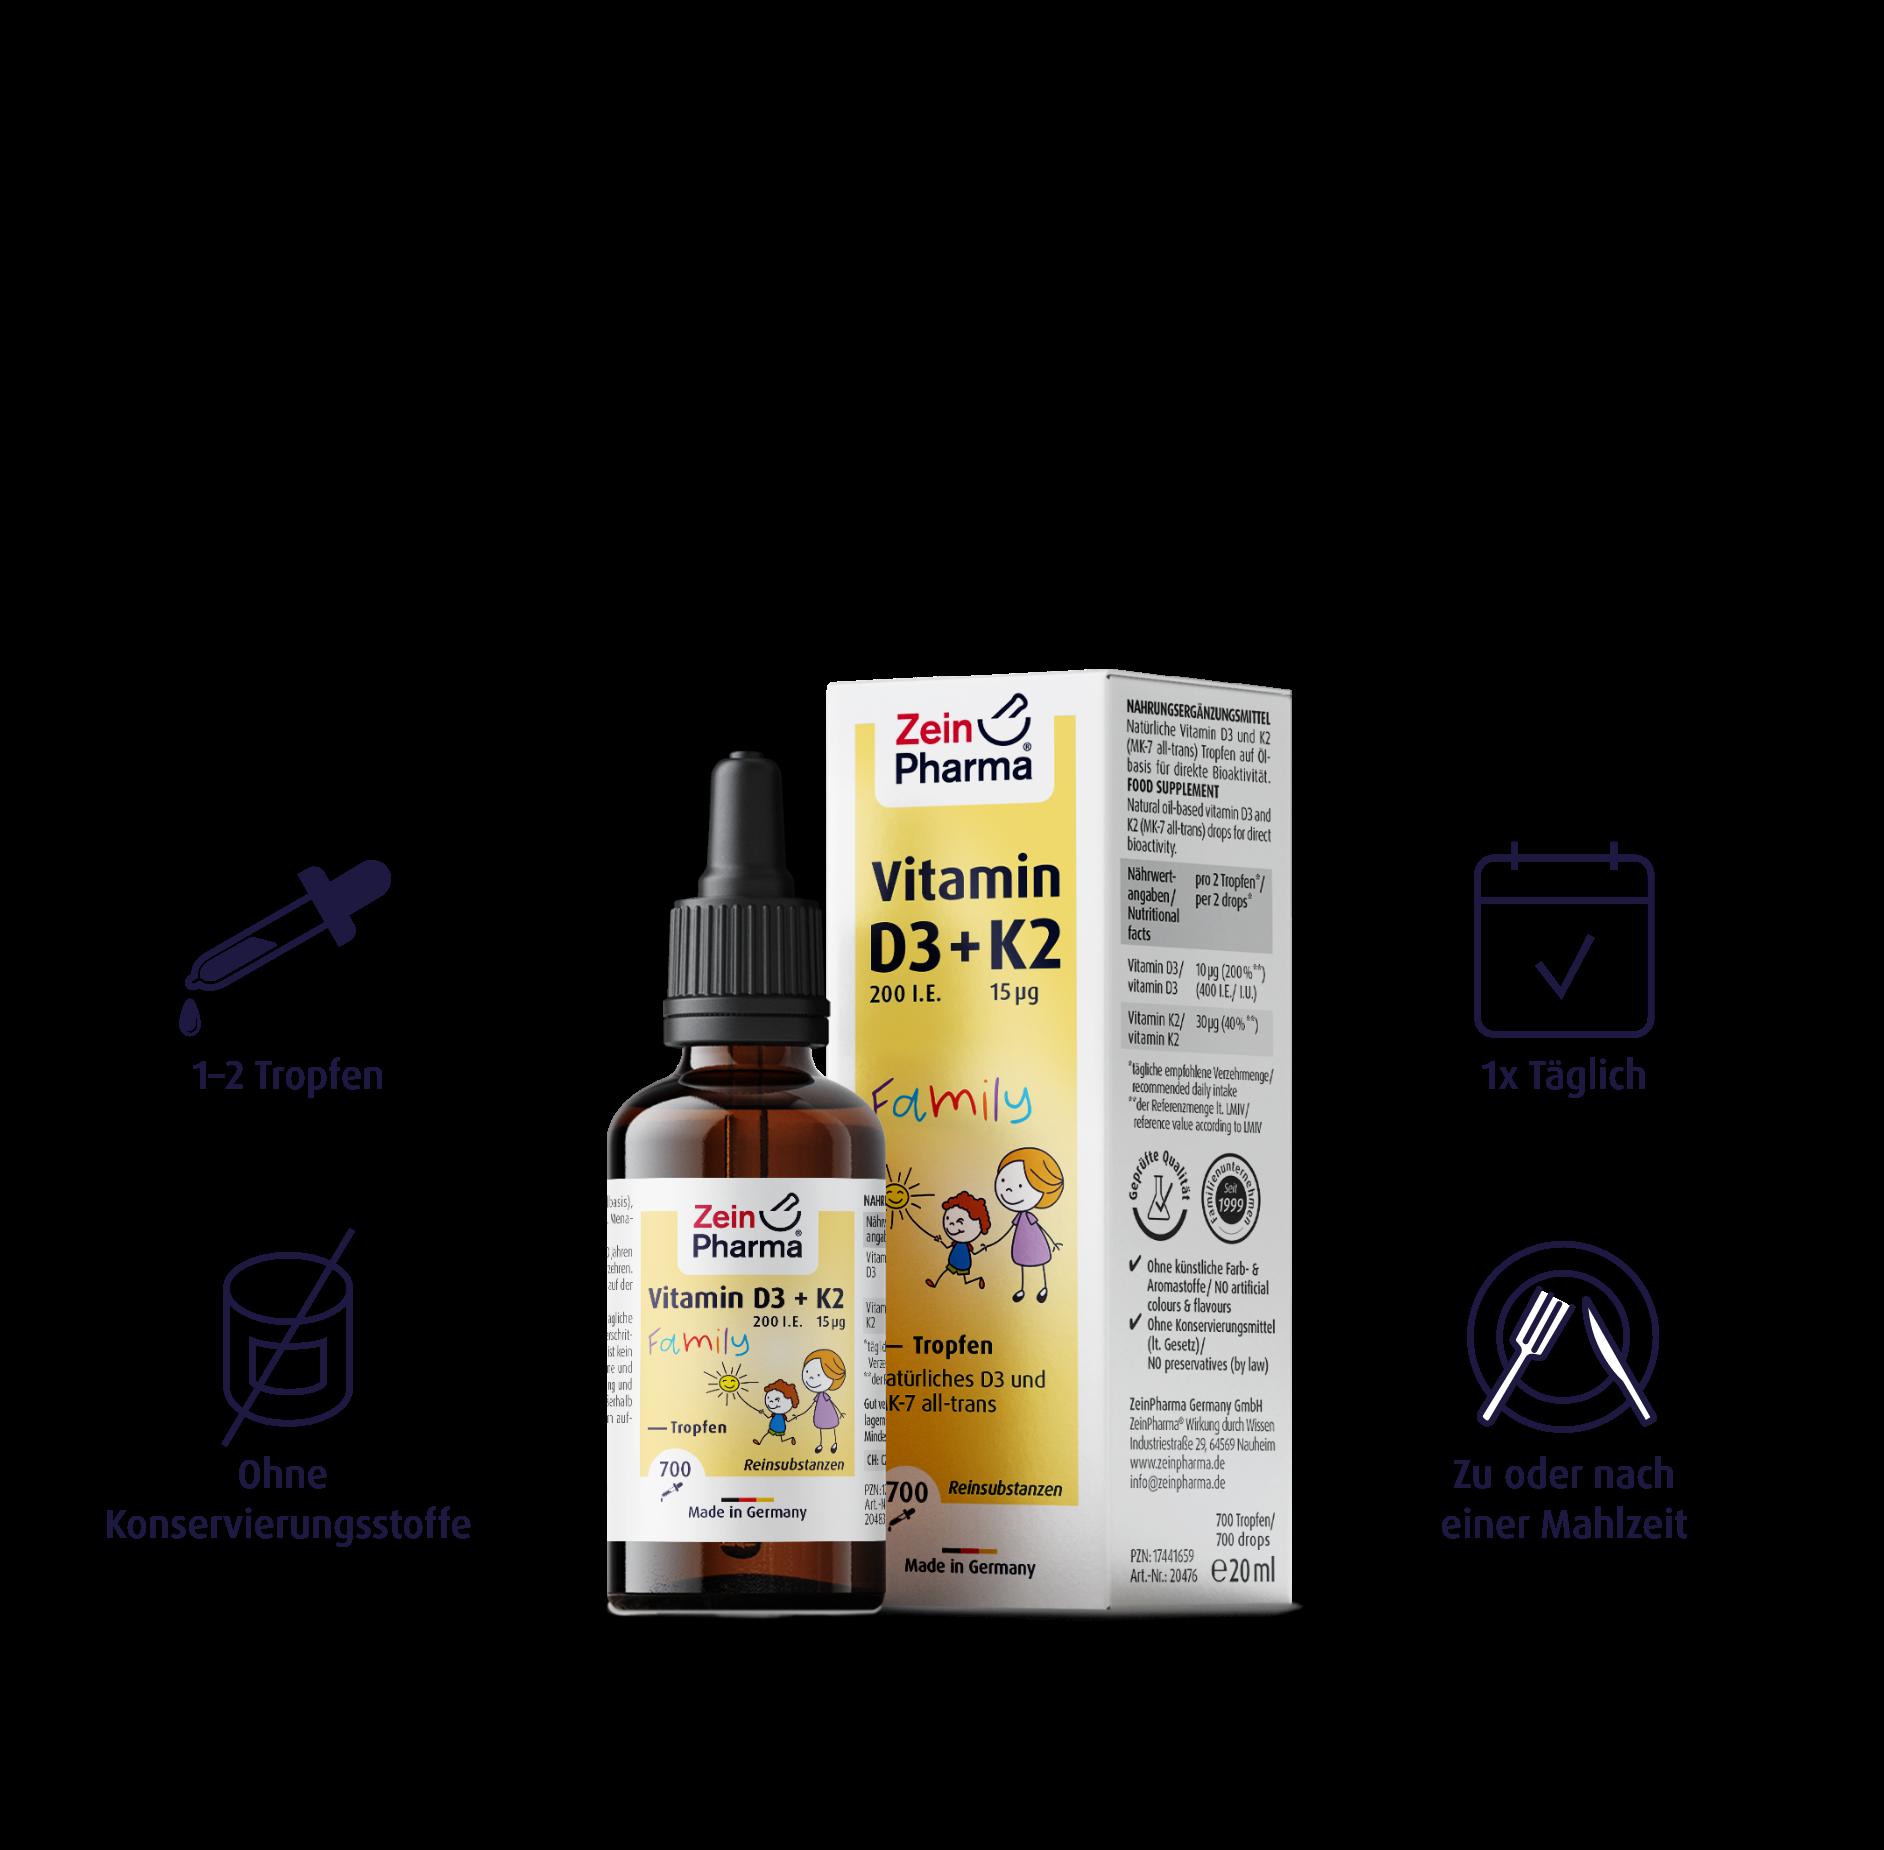 Vitamin D3 + K2 MK-7 Family Tropfen